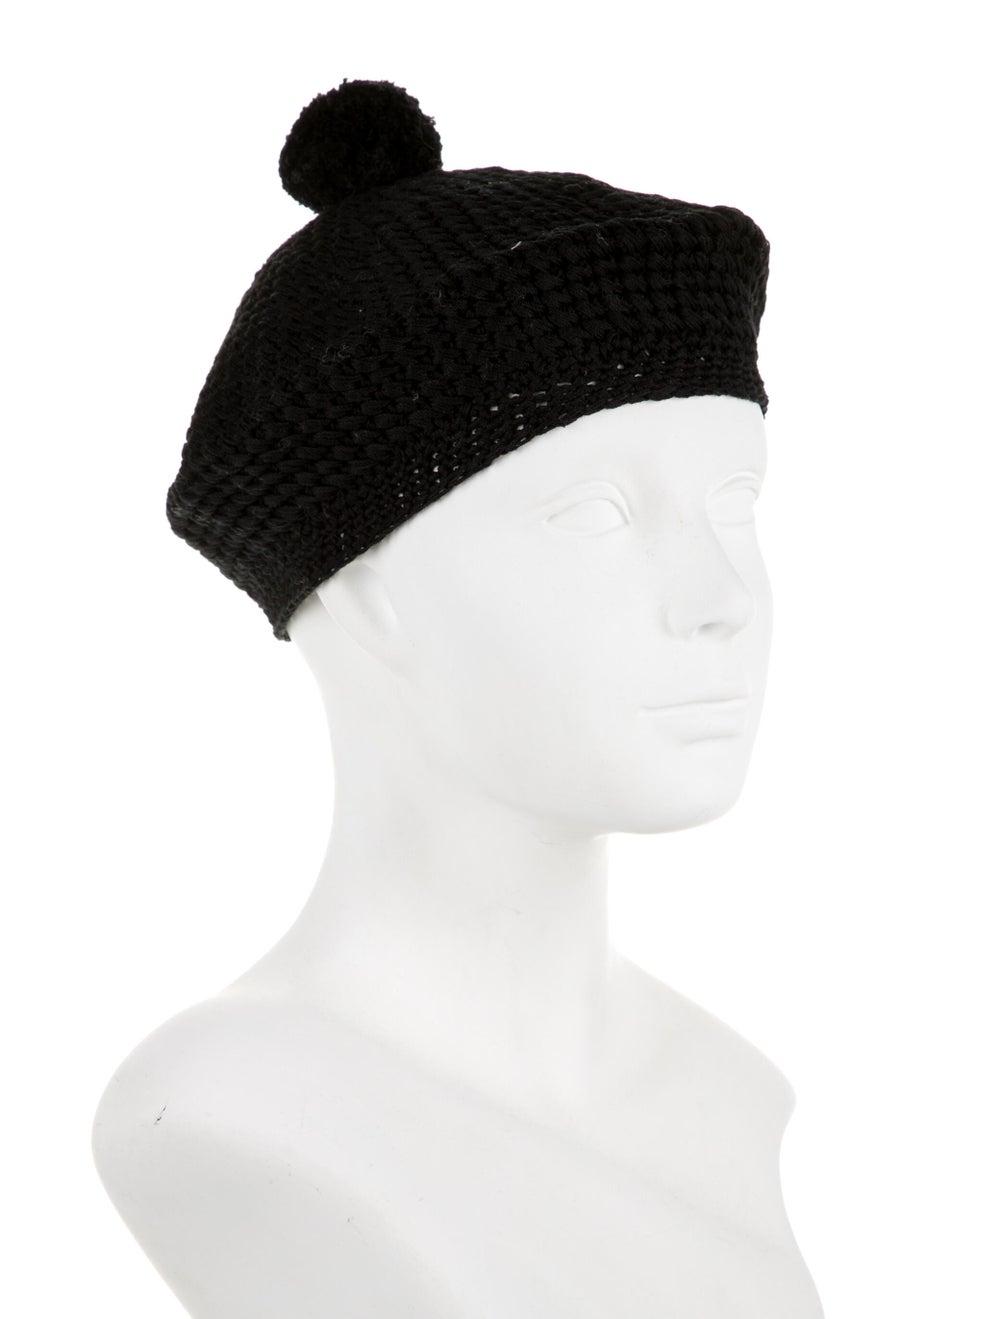 Gucci Knit Pom-Pom Beret Black - image 3